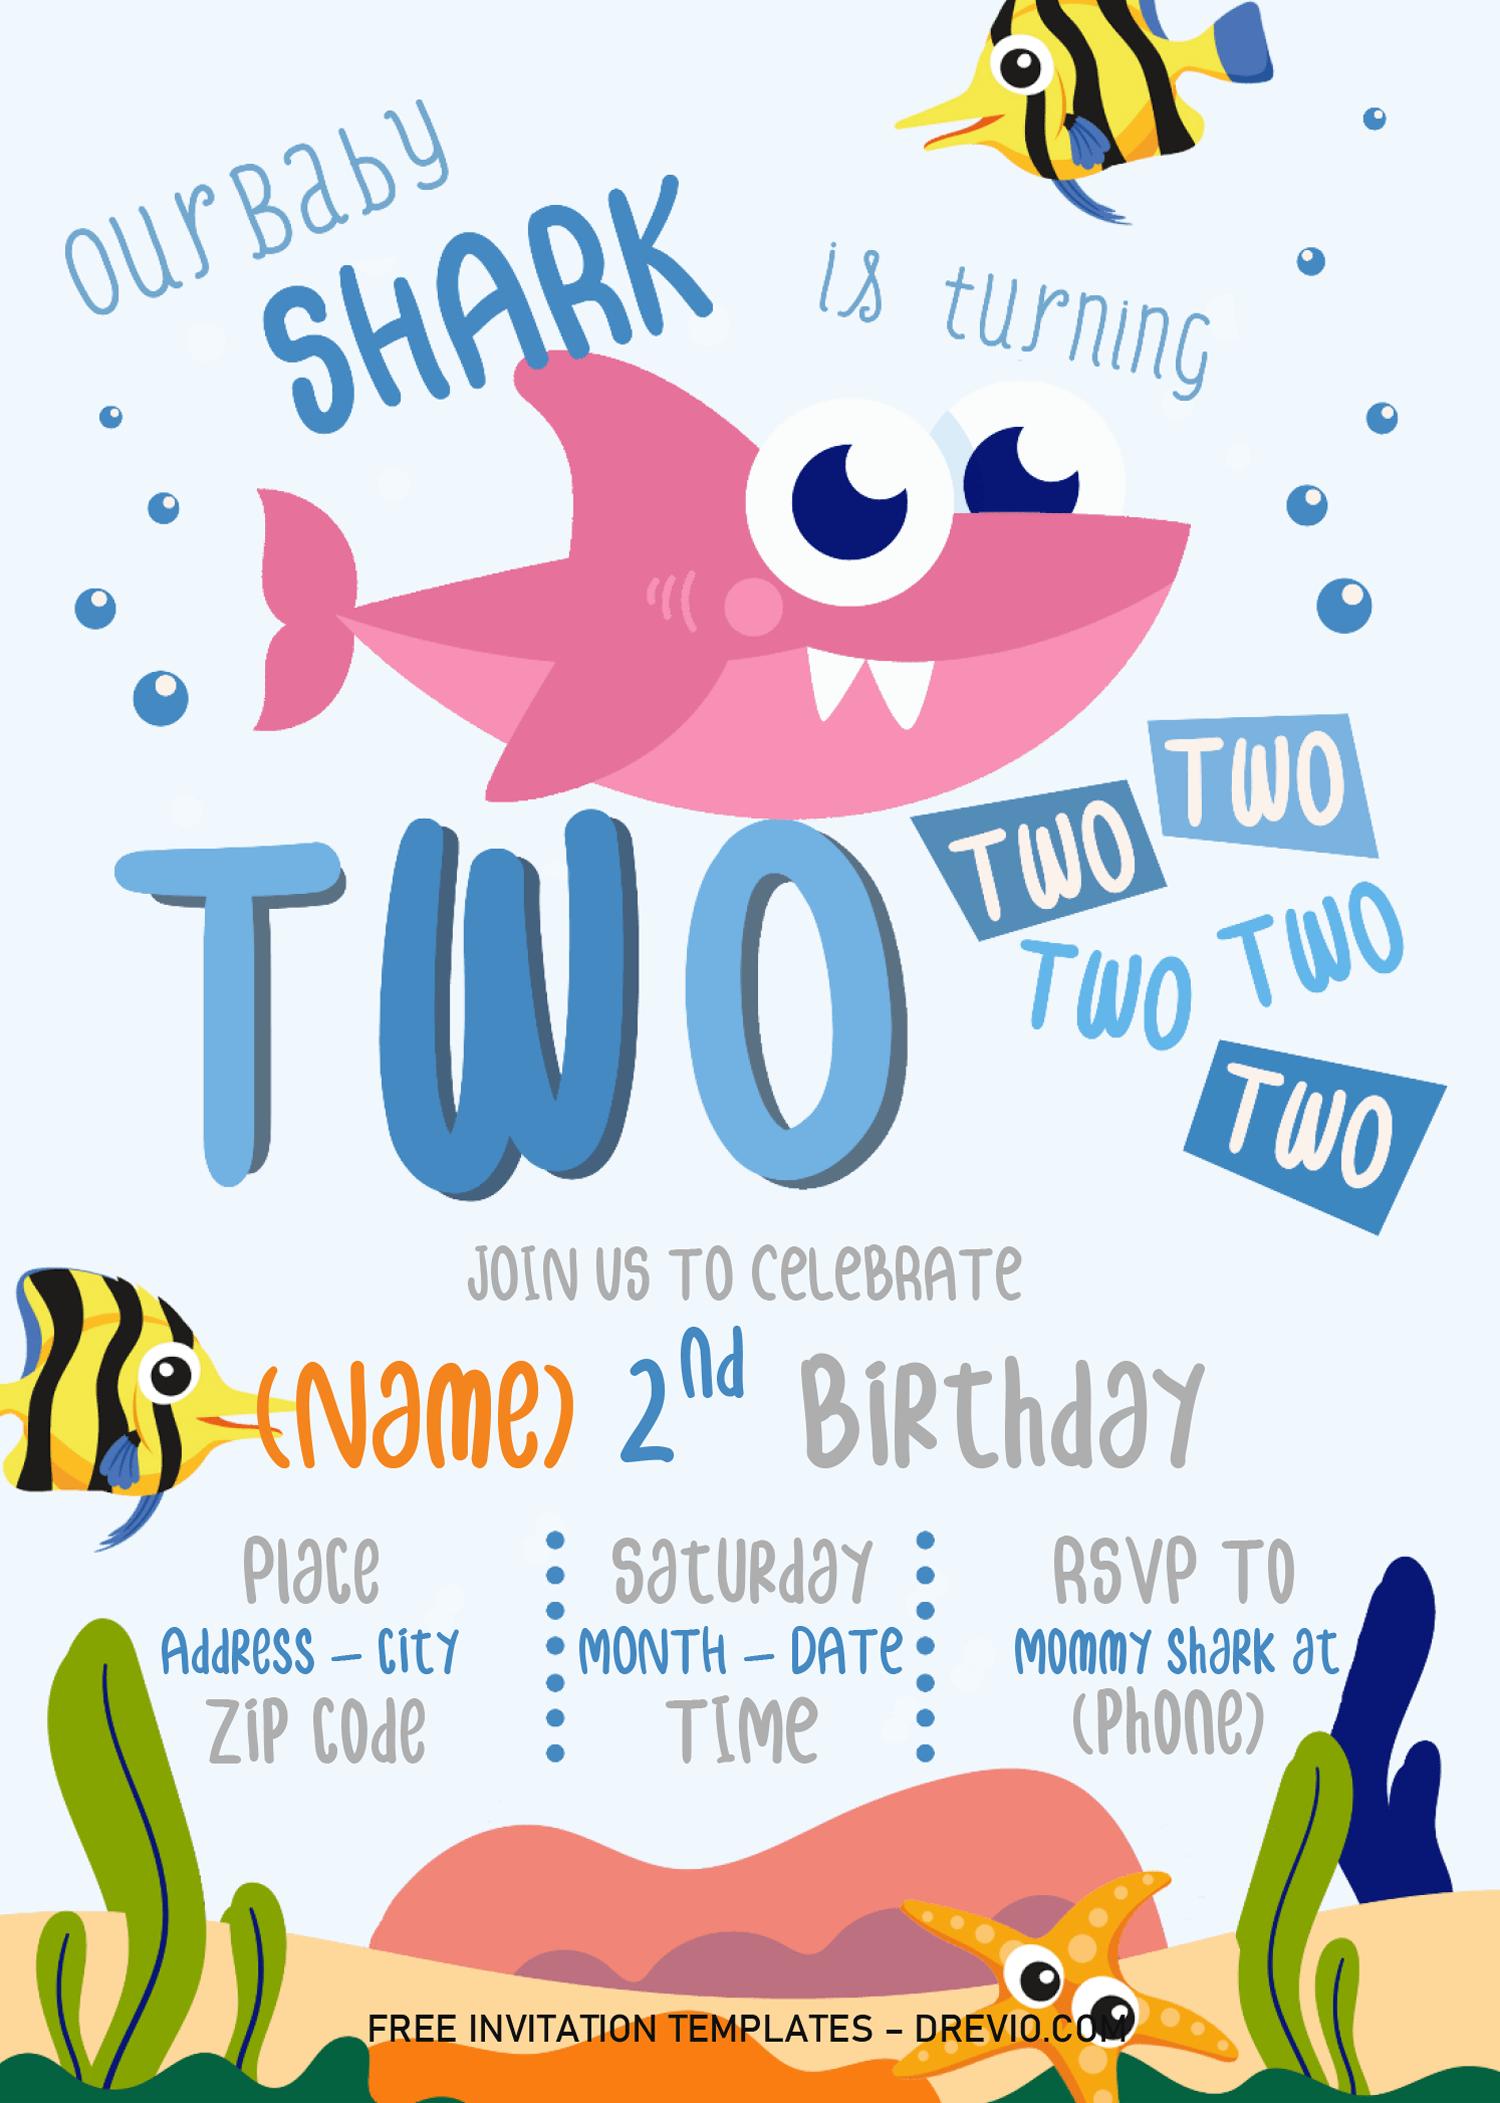 Baby Shark Invitation Templates Editable With Microsoft Word Download Hundreds Free Printable Birthday Invitation Templates